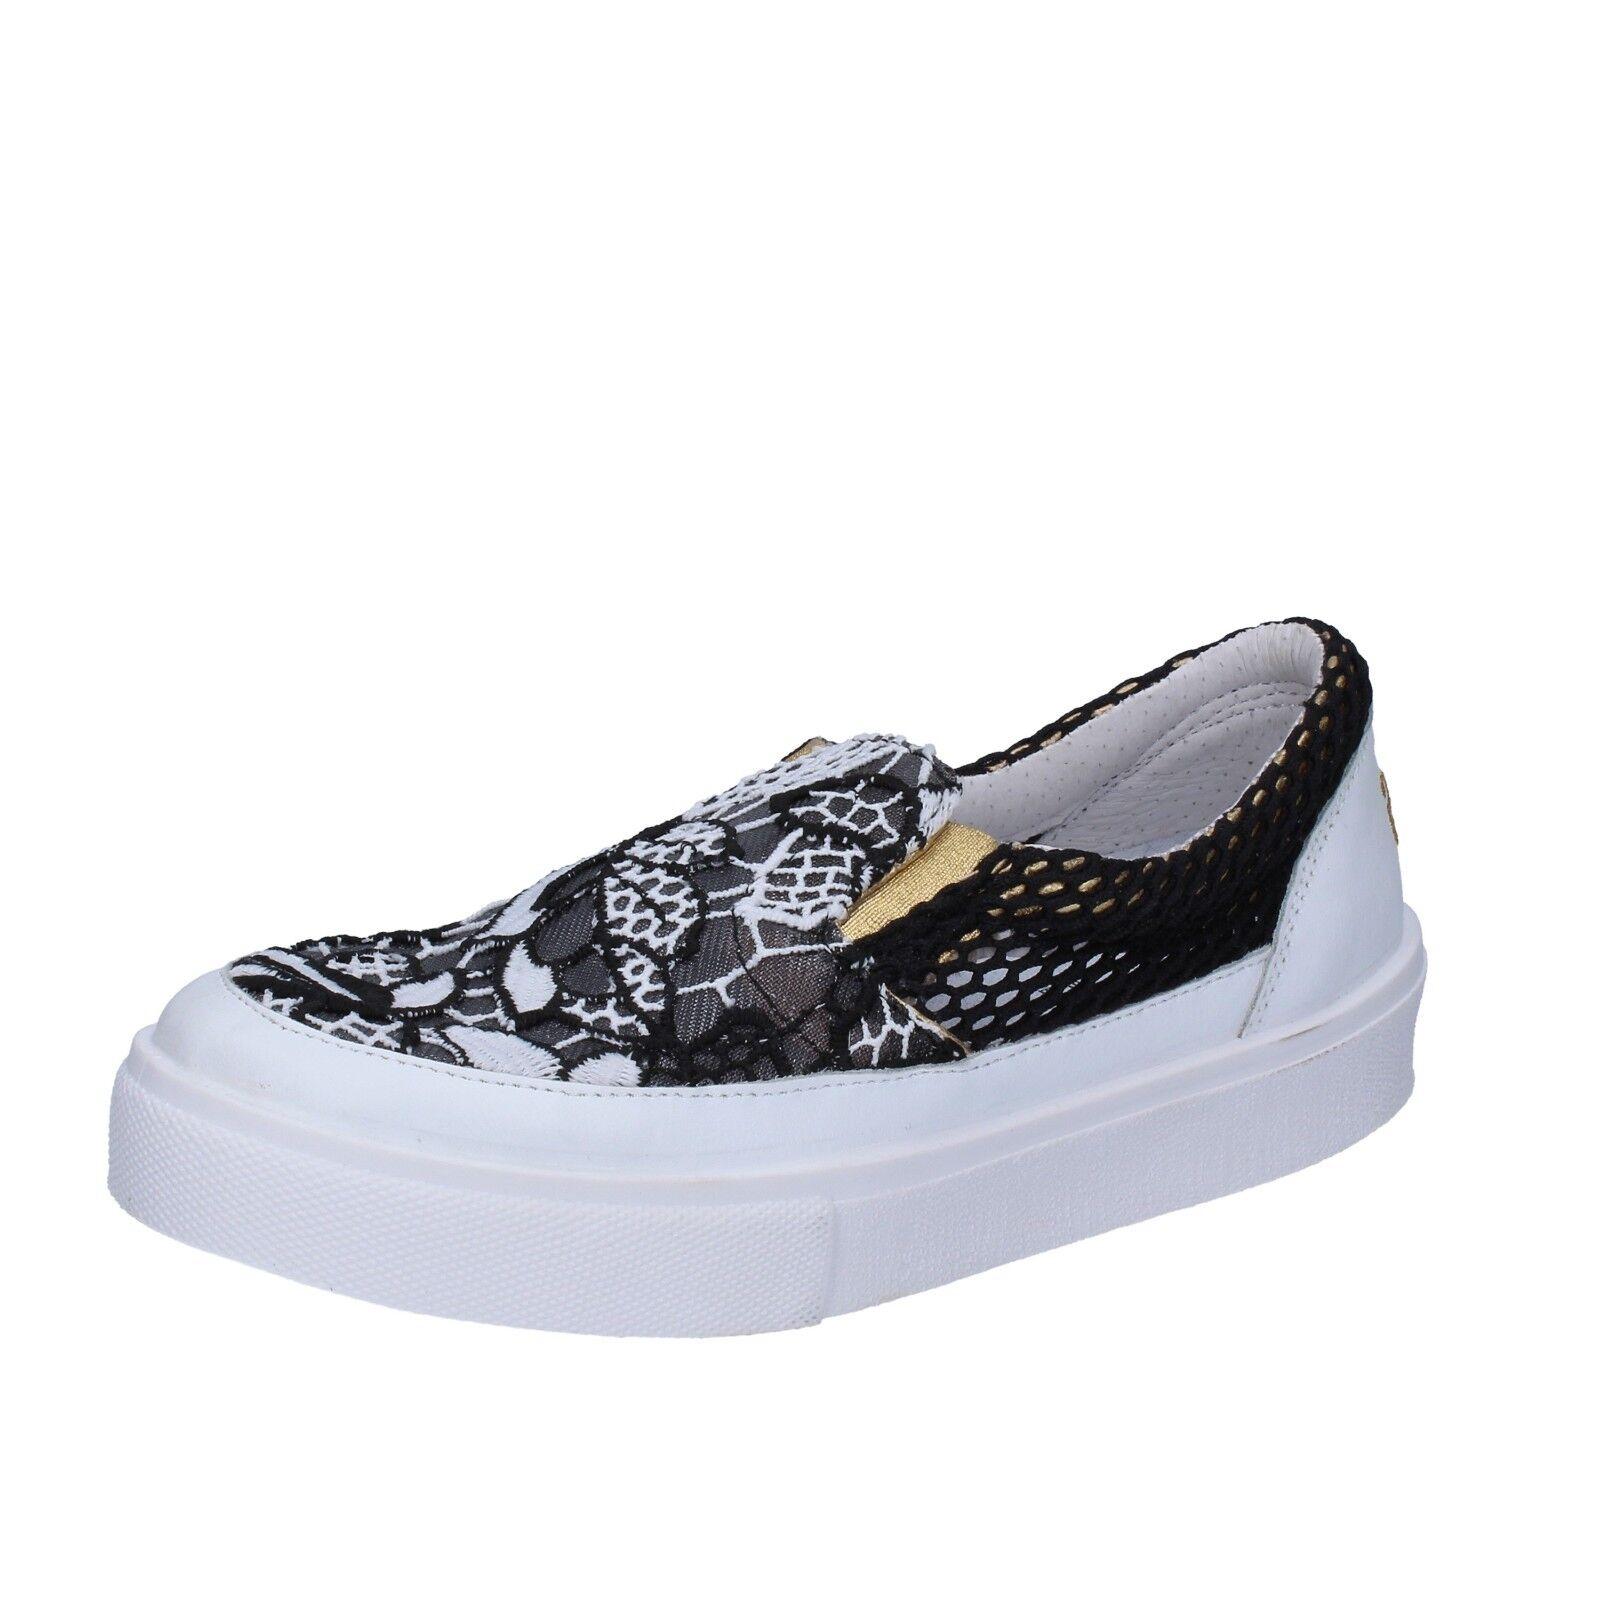 Chaussures Pointure 2 Star 5 (UE 38) à Enfiler noir blanc Textile Cuir BT807-38